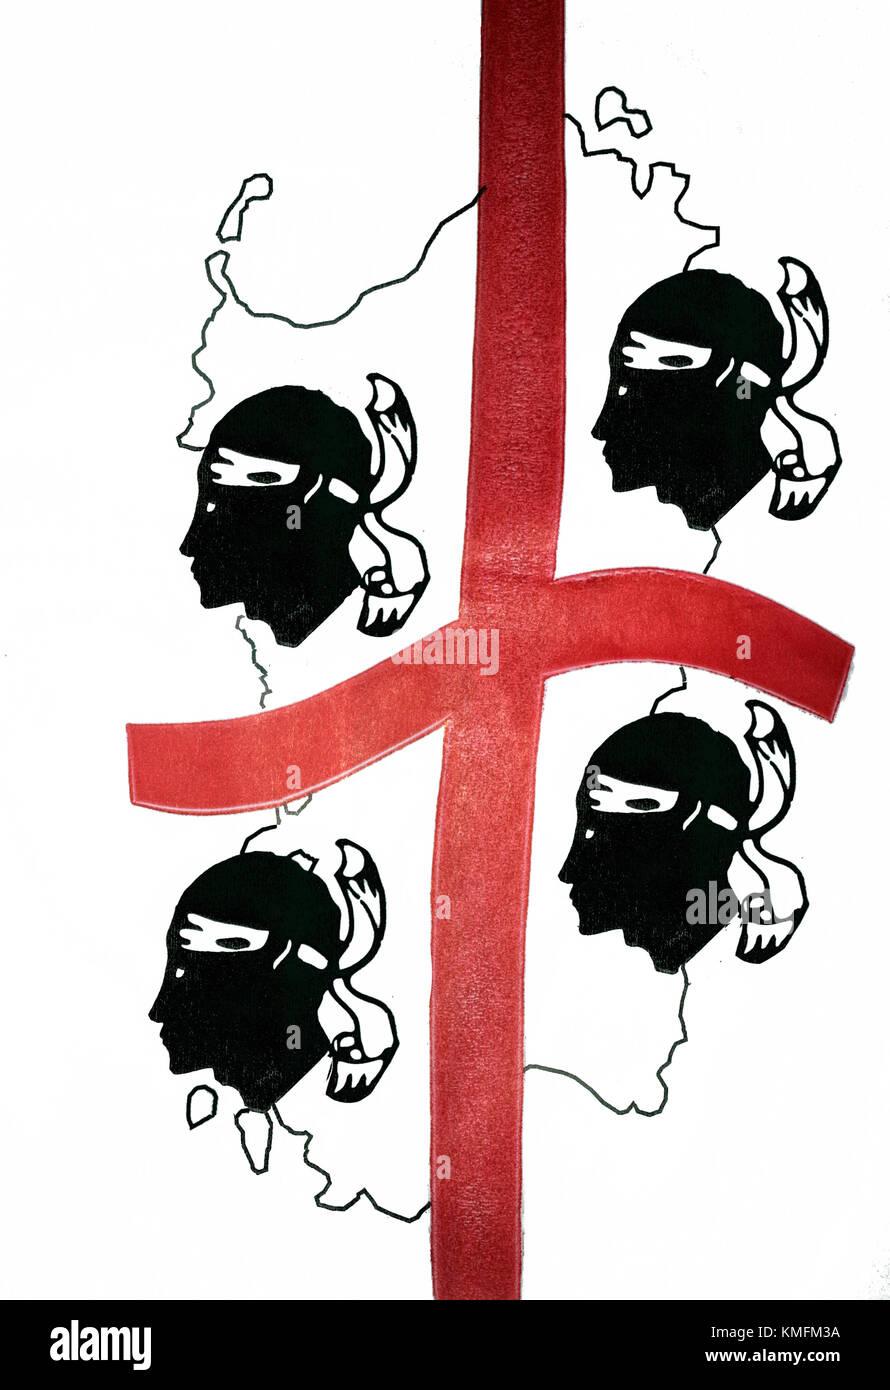 The 'Foor Moors', the symbol of Sardinia - Stock Image